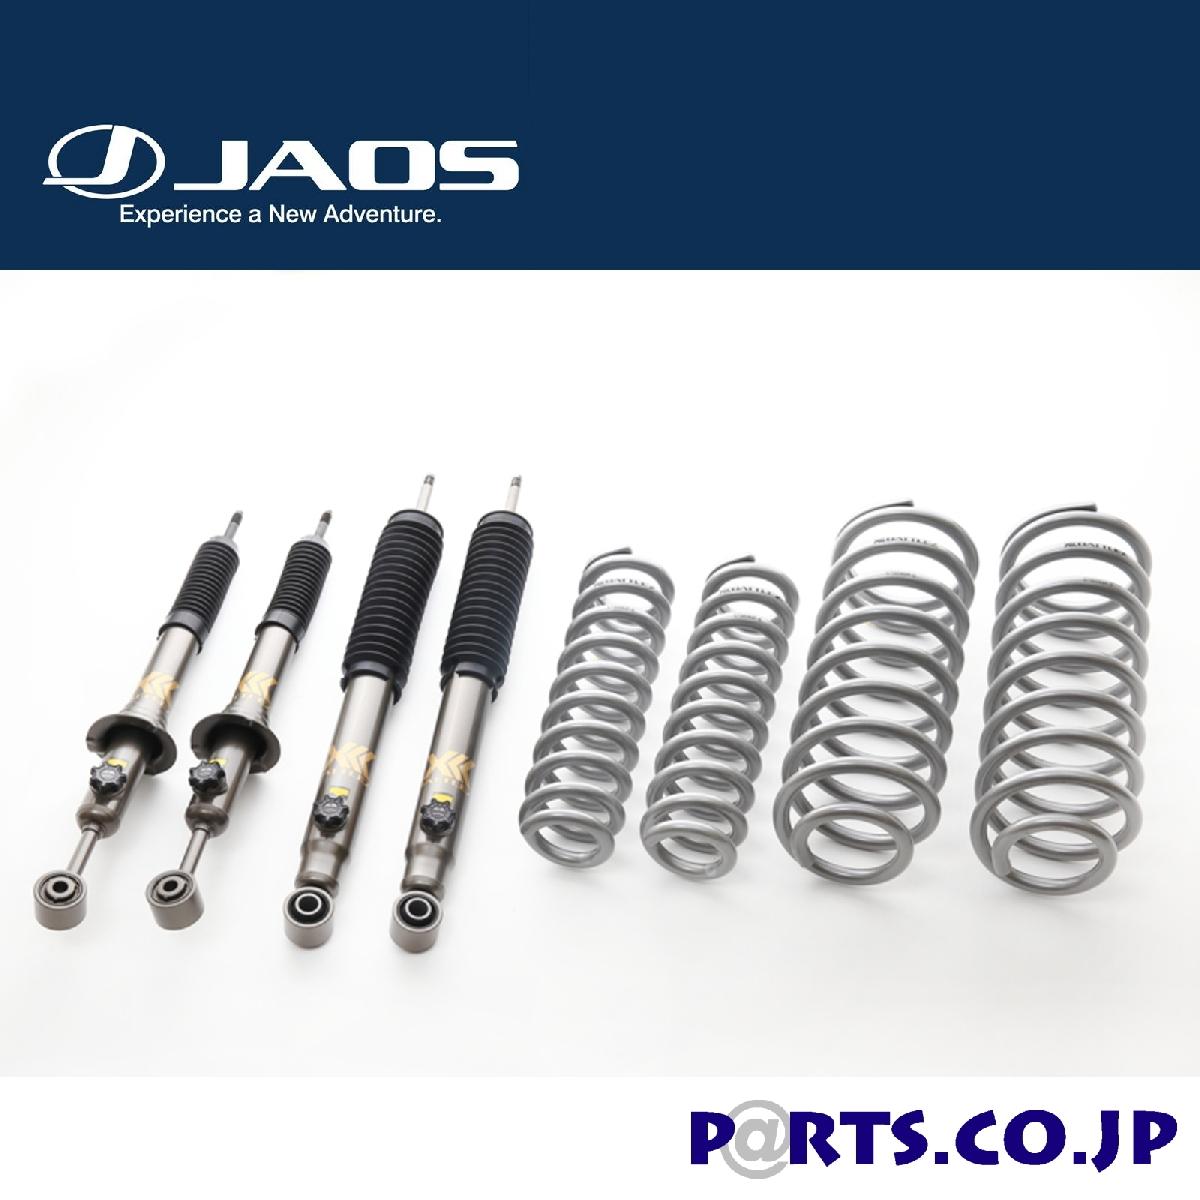 JAOS(ジャオス) トヨタ ランドクルーザープラド スプリング&ショックセット BATTLEZ UP SUSPENSION SET VFA PRADO150 09+ GASOLINE